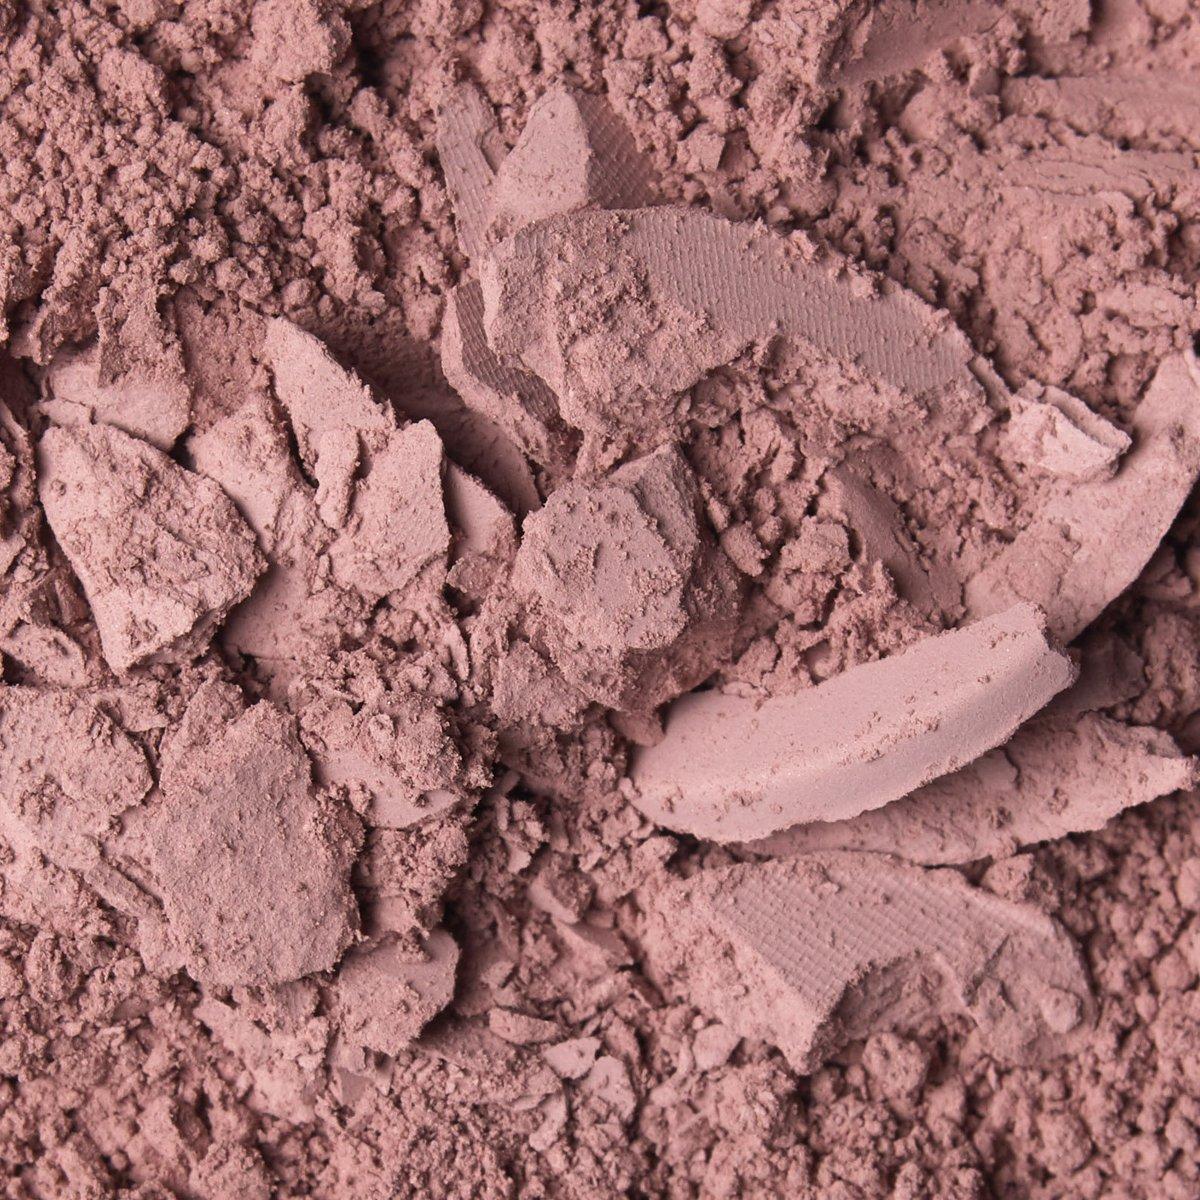 CREAMY MAUVE: A matte dusty rose shade in the Matte Mauve Pressed Powder Palette